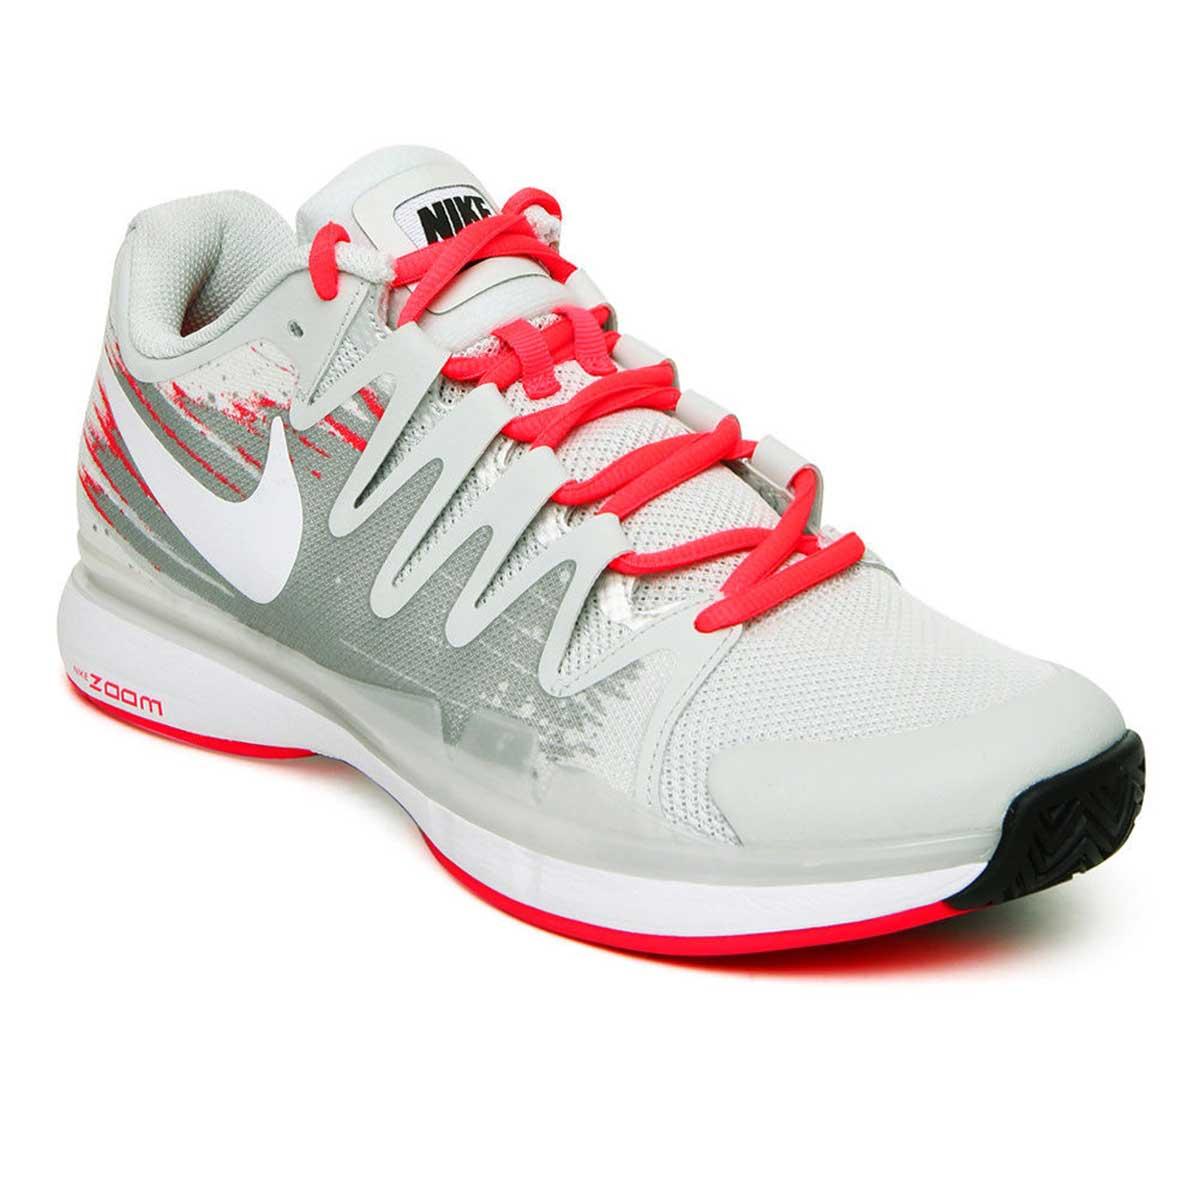 fe9d6e174593 Buy Nike Zoom Vapor 9.5 Tour Tennis Shoes (Lite Grey White) Online